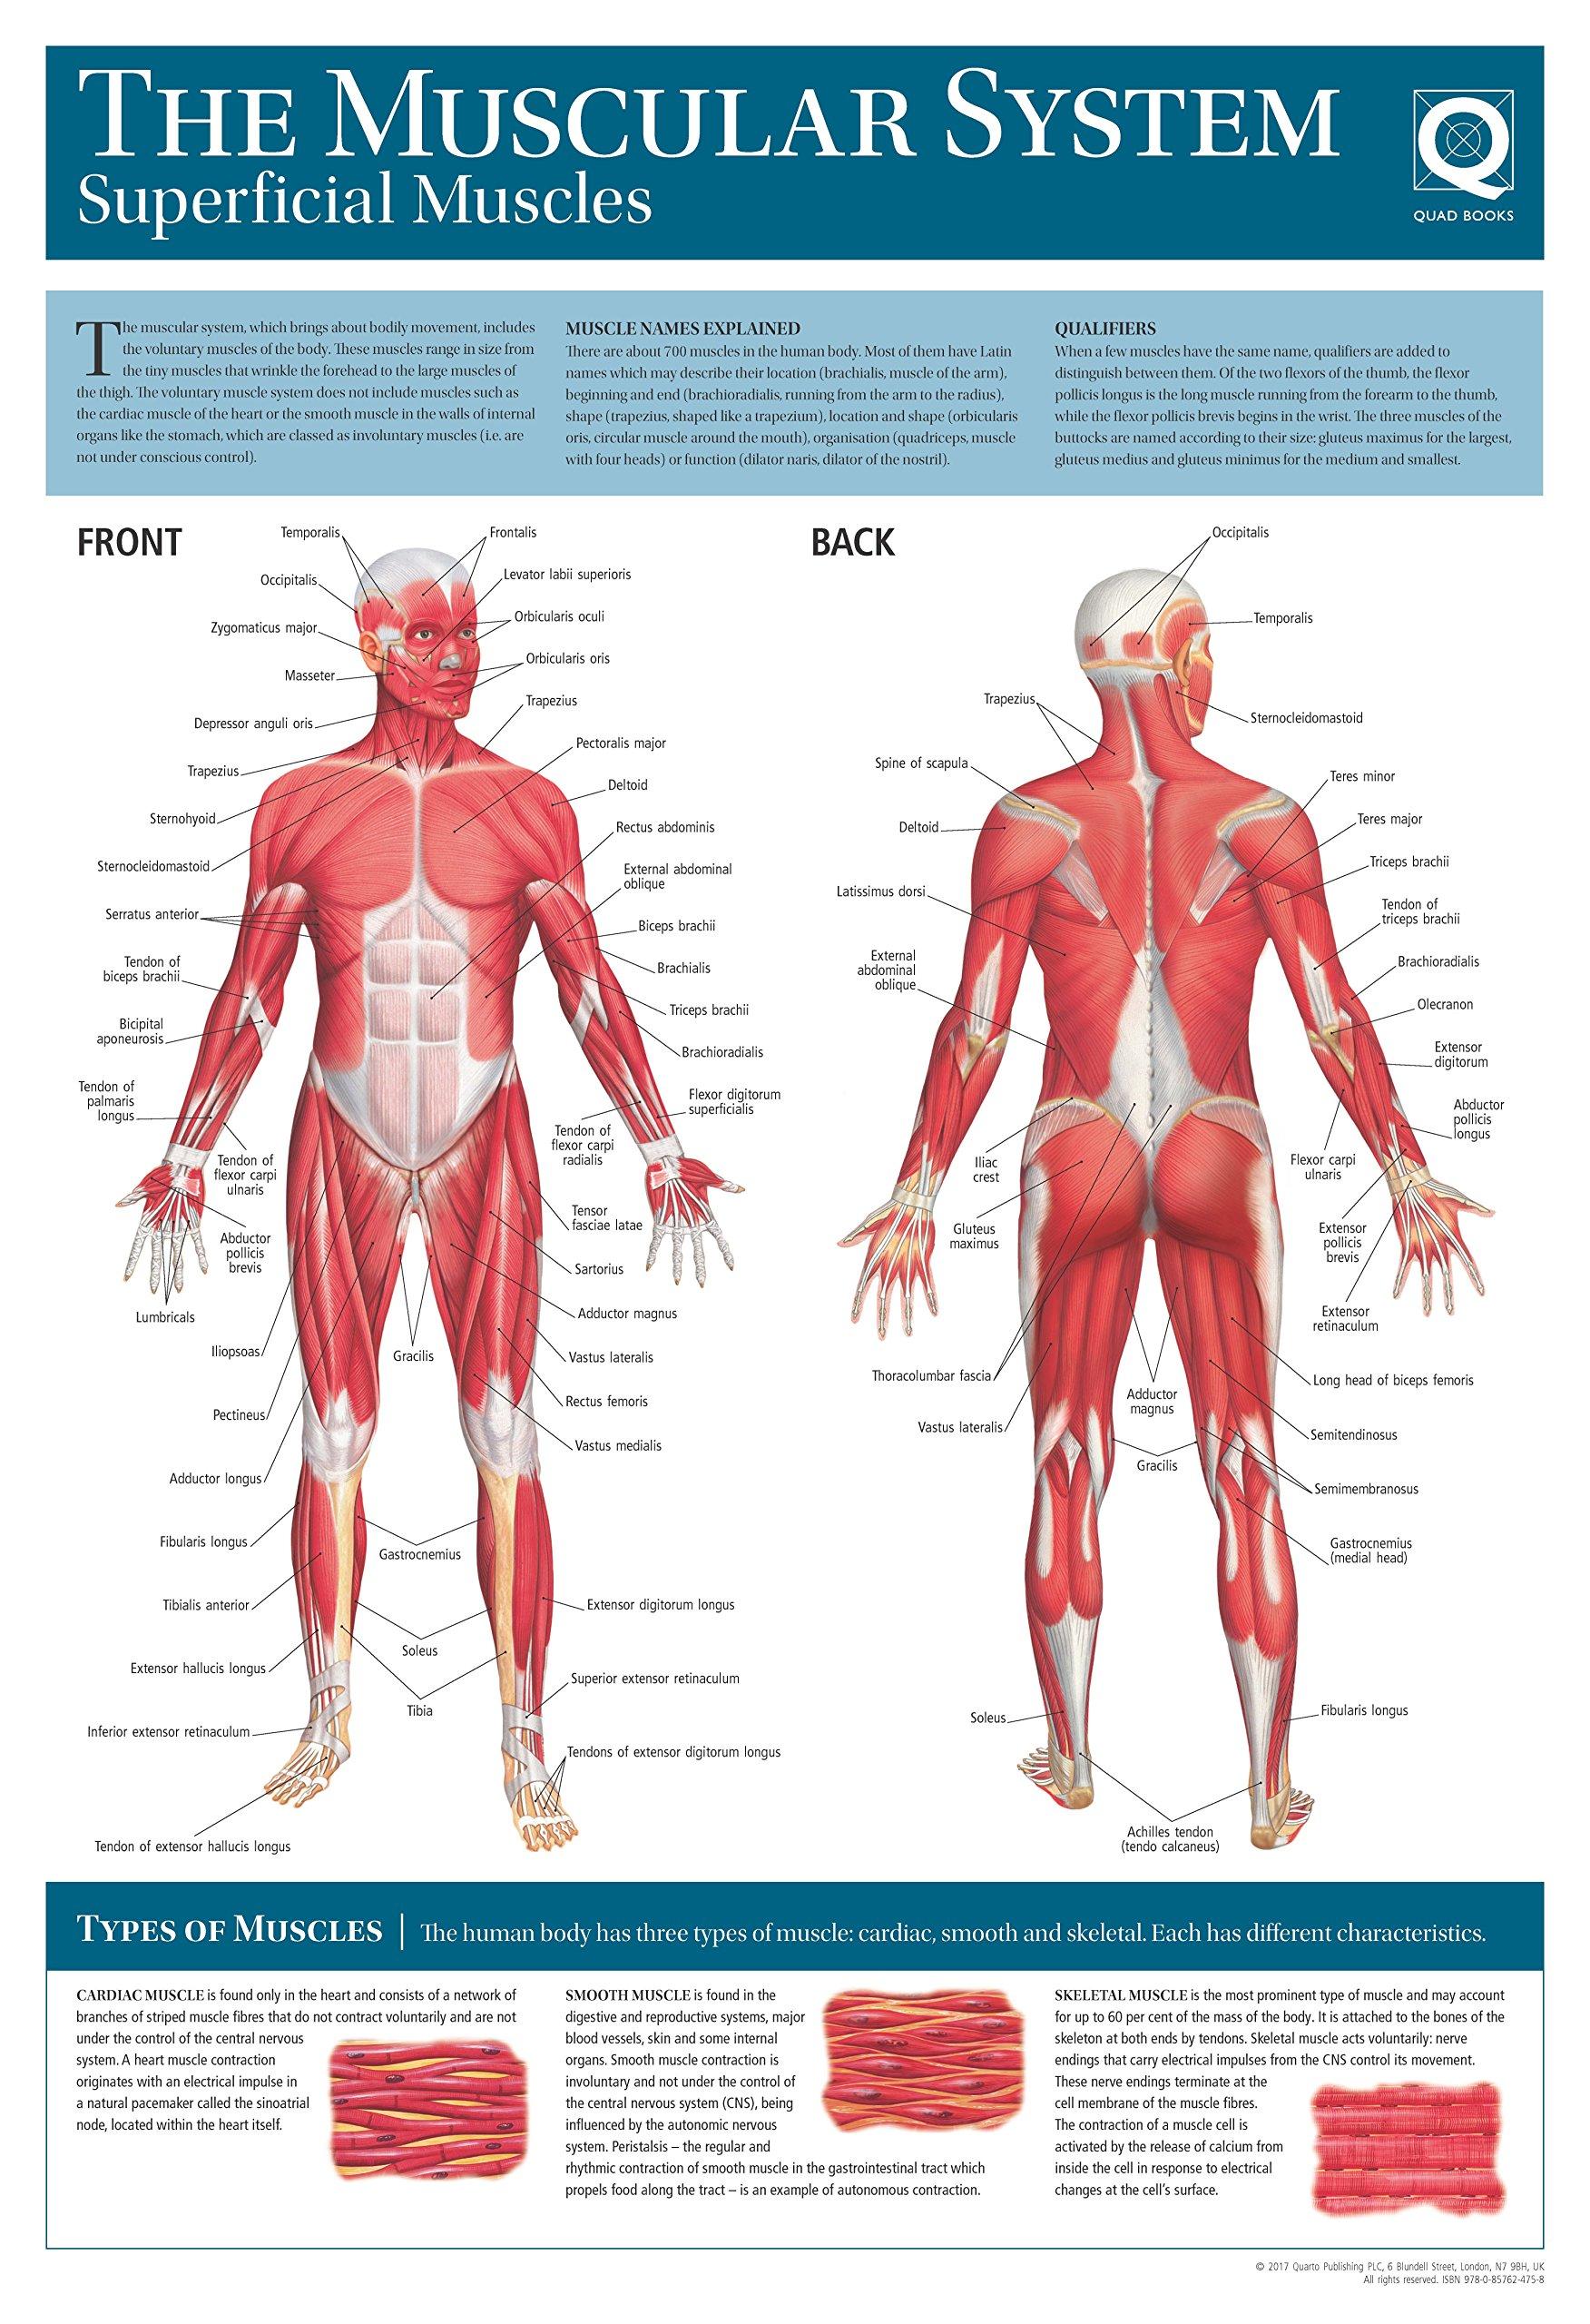 Human Anatomy Wallchart: The Muscular System: Amazon.es: Quad Books ...